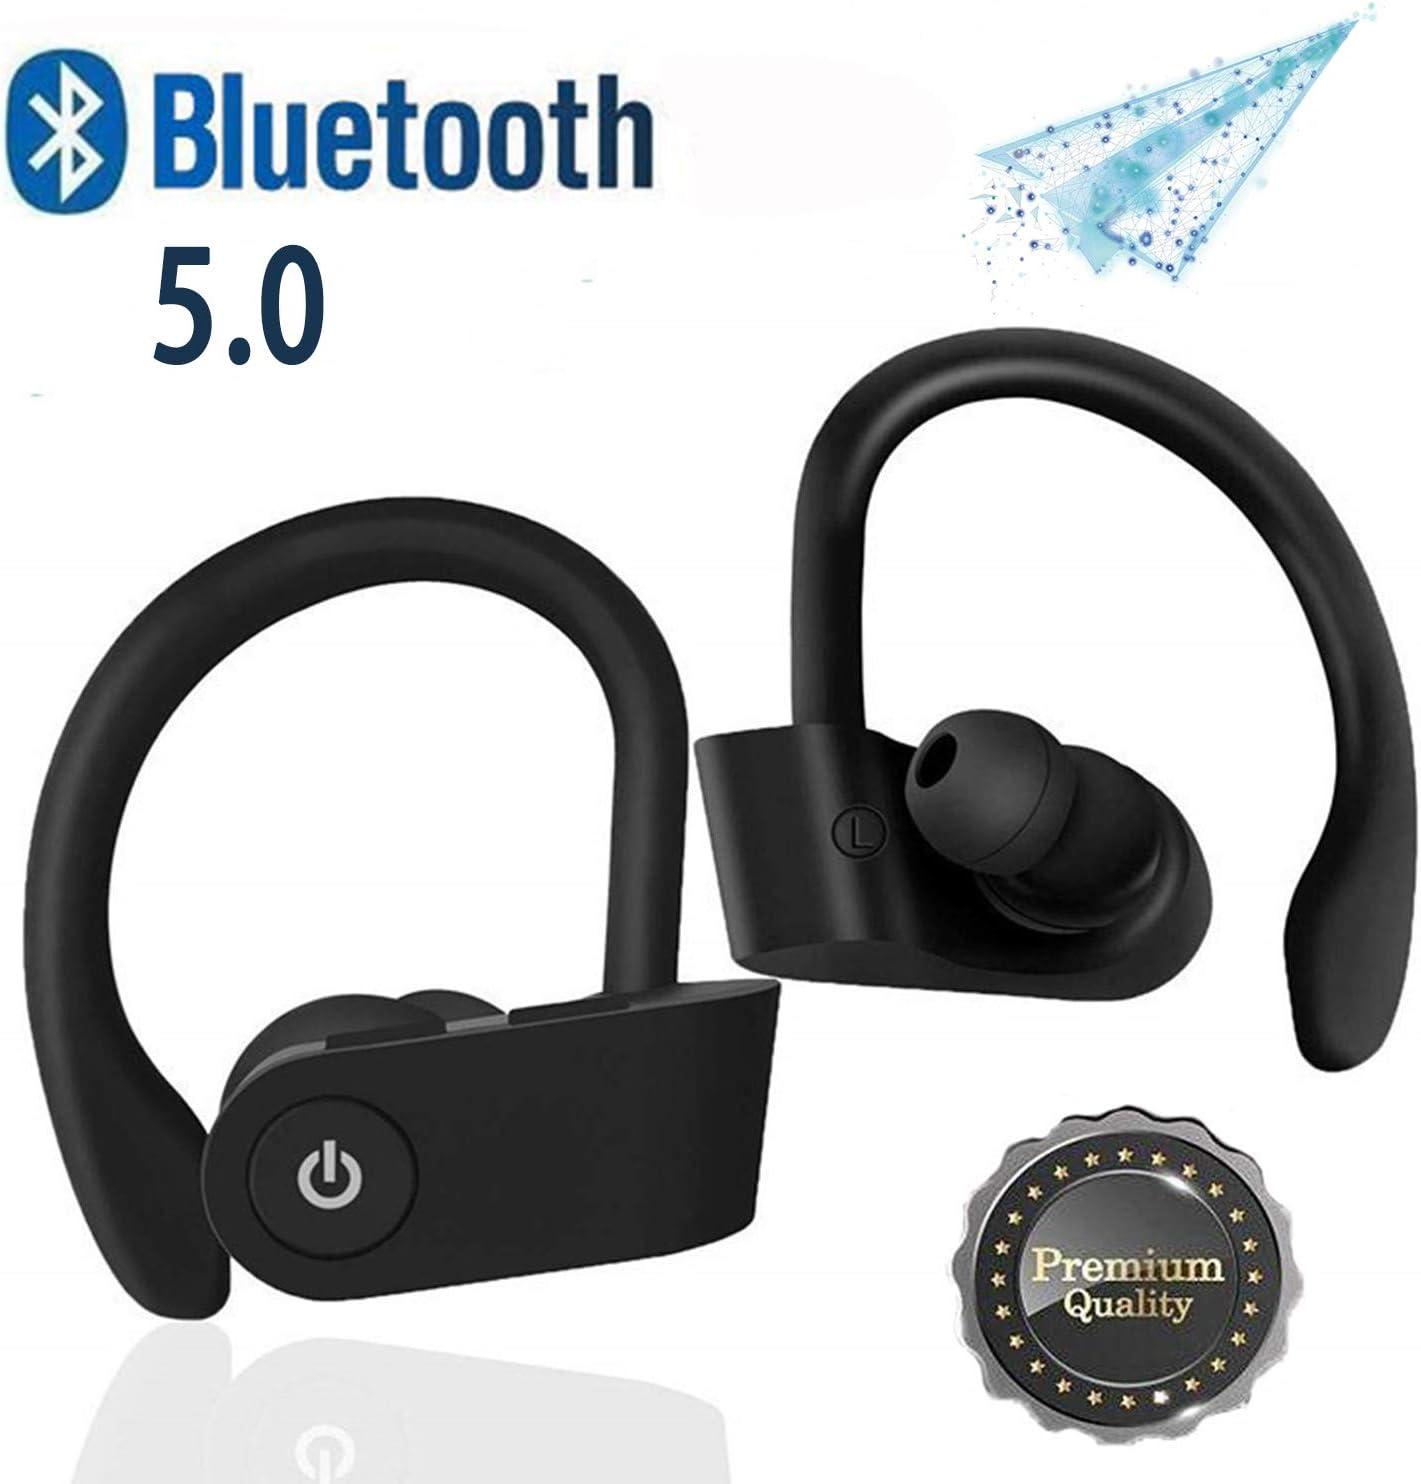 DGDBTJJSJ Auriculares Inalámbricos Bluetooth 5.0, Auriculares estéreo HD IPX5 livianos e Impermeables